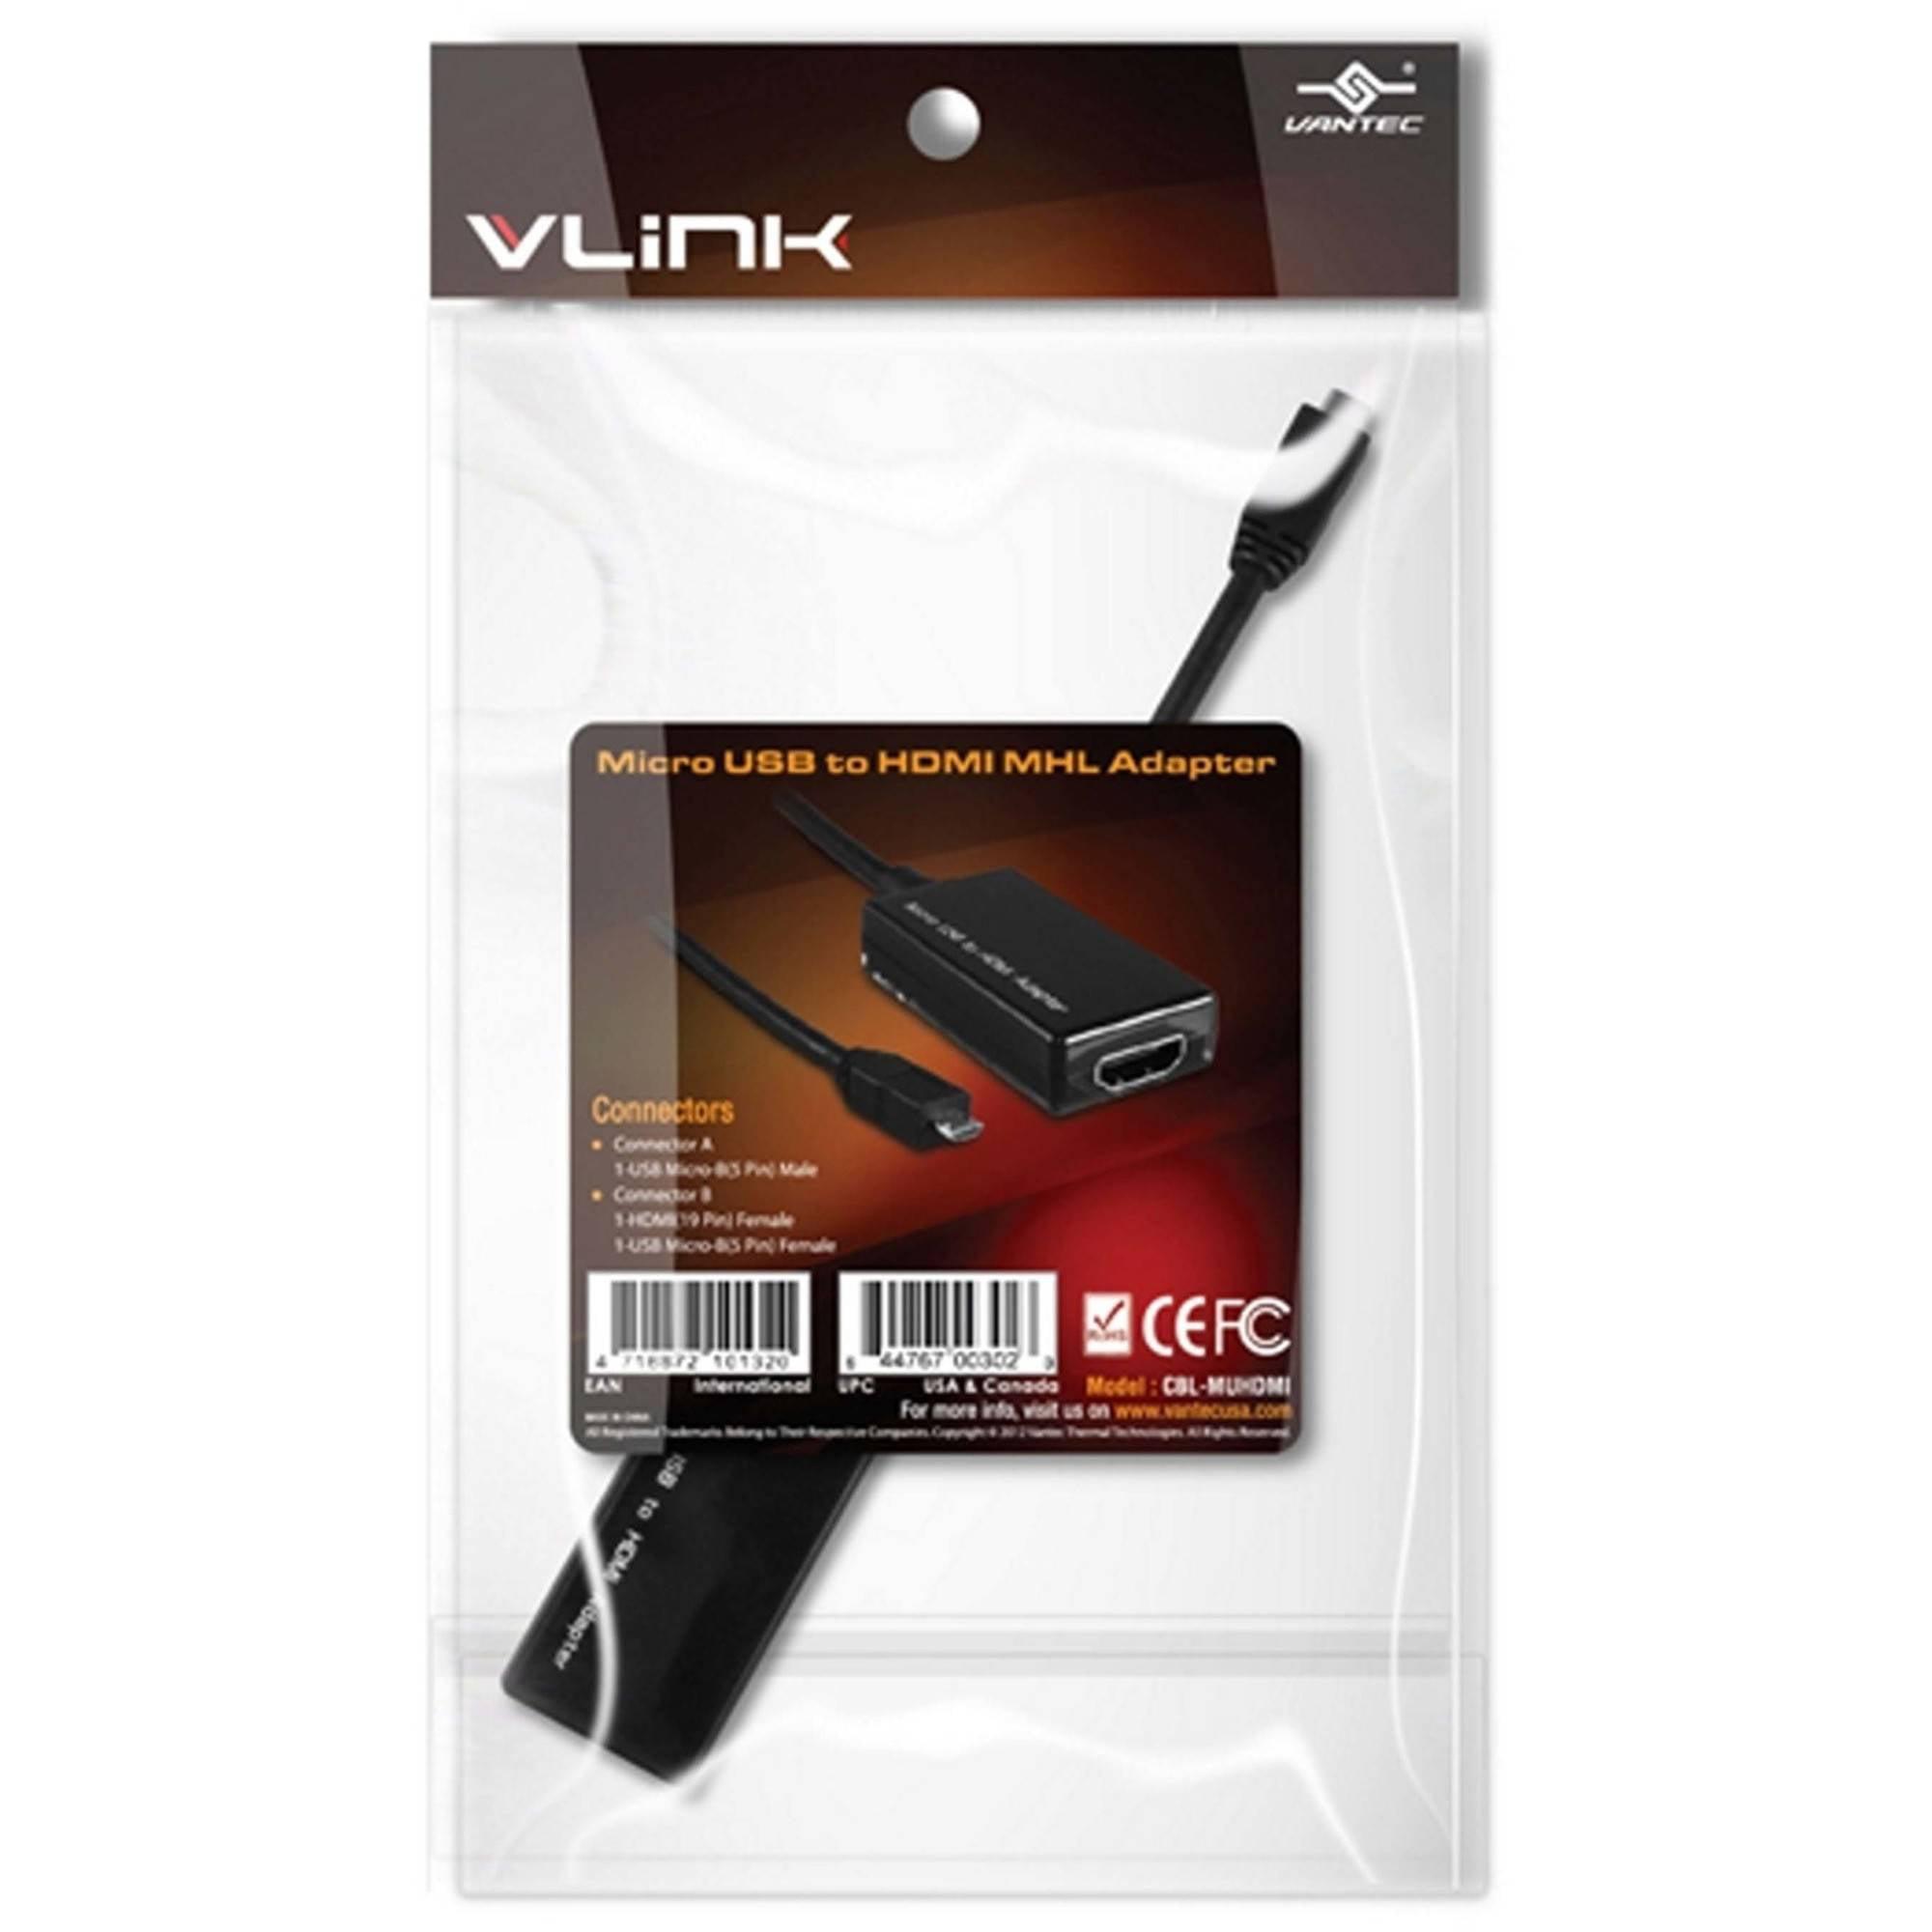 Vantec CBL-MUHDMI microUSB to HDMI MHL Adapter, Black